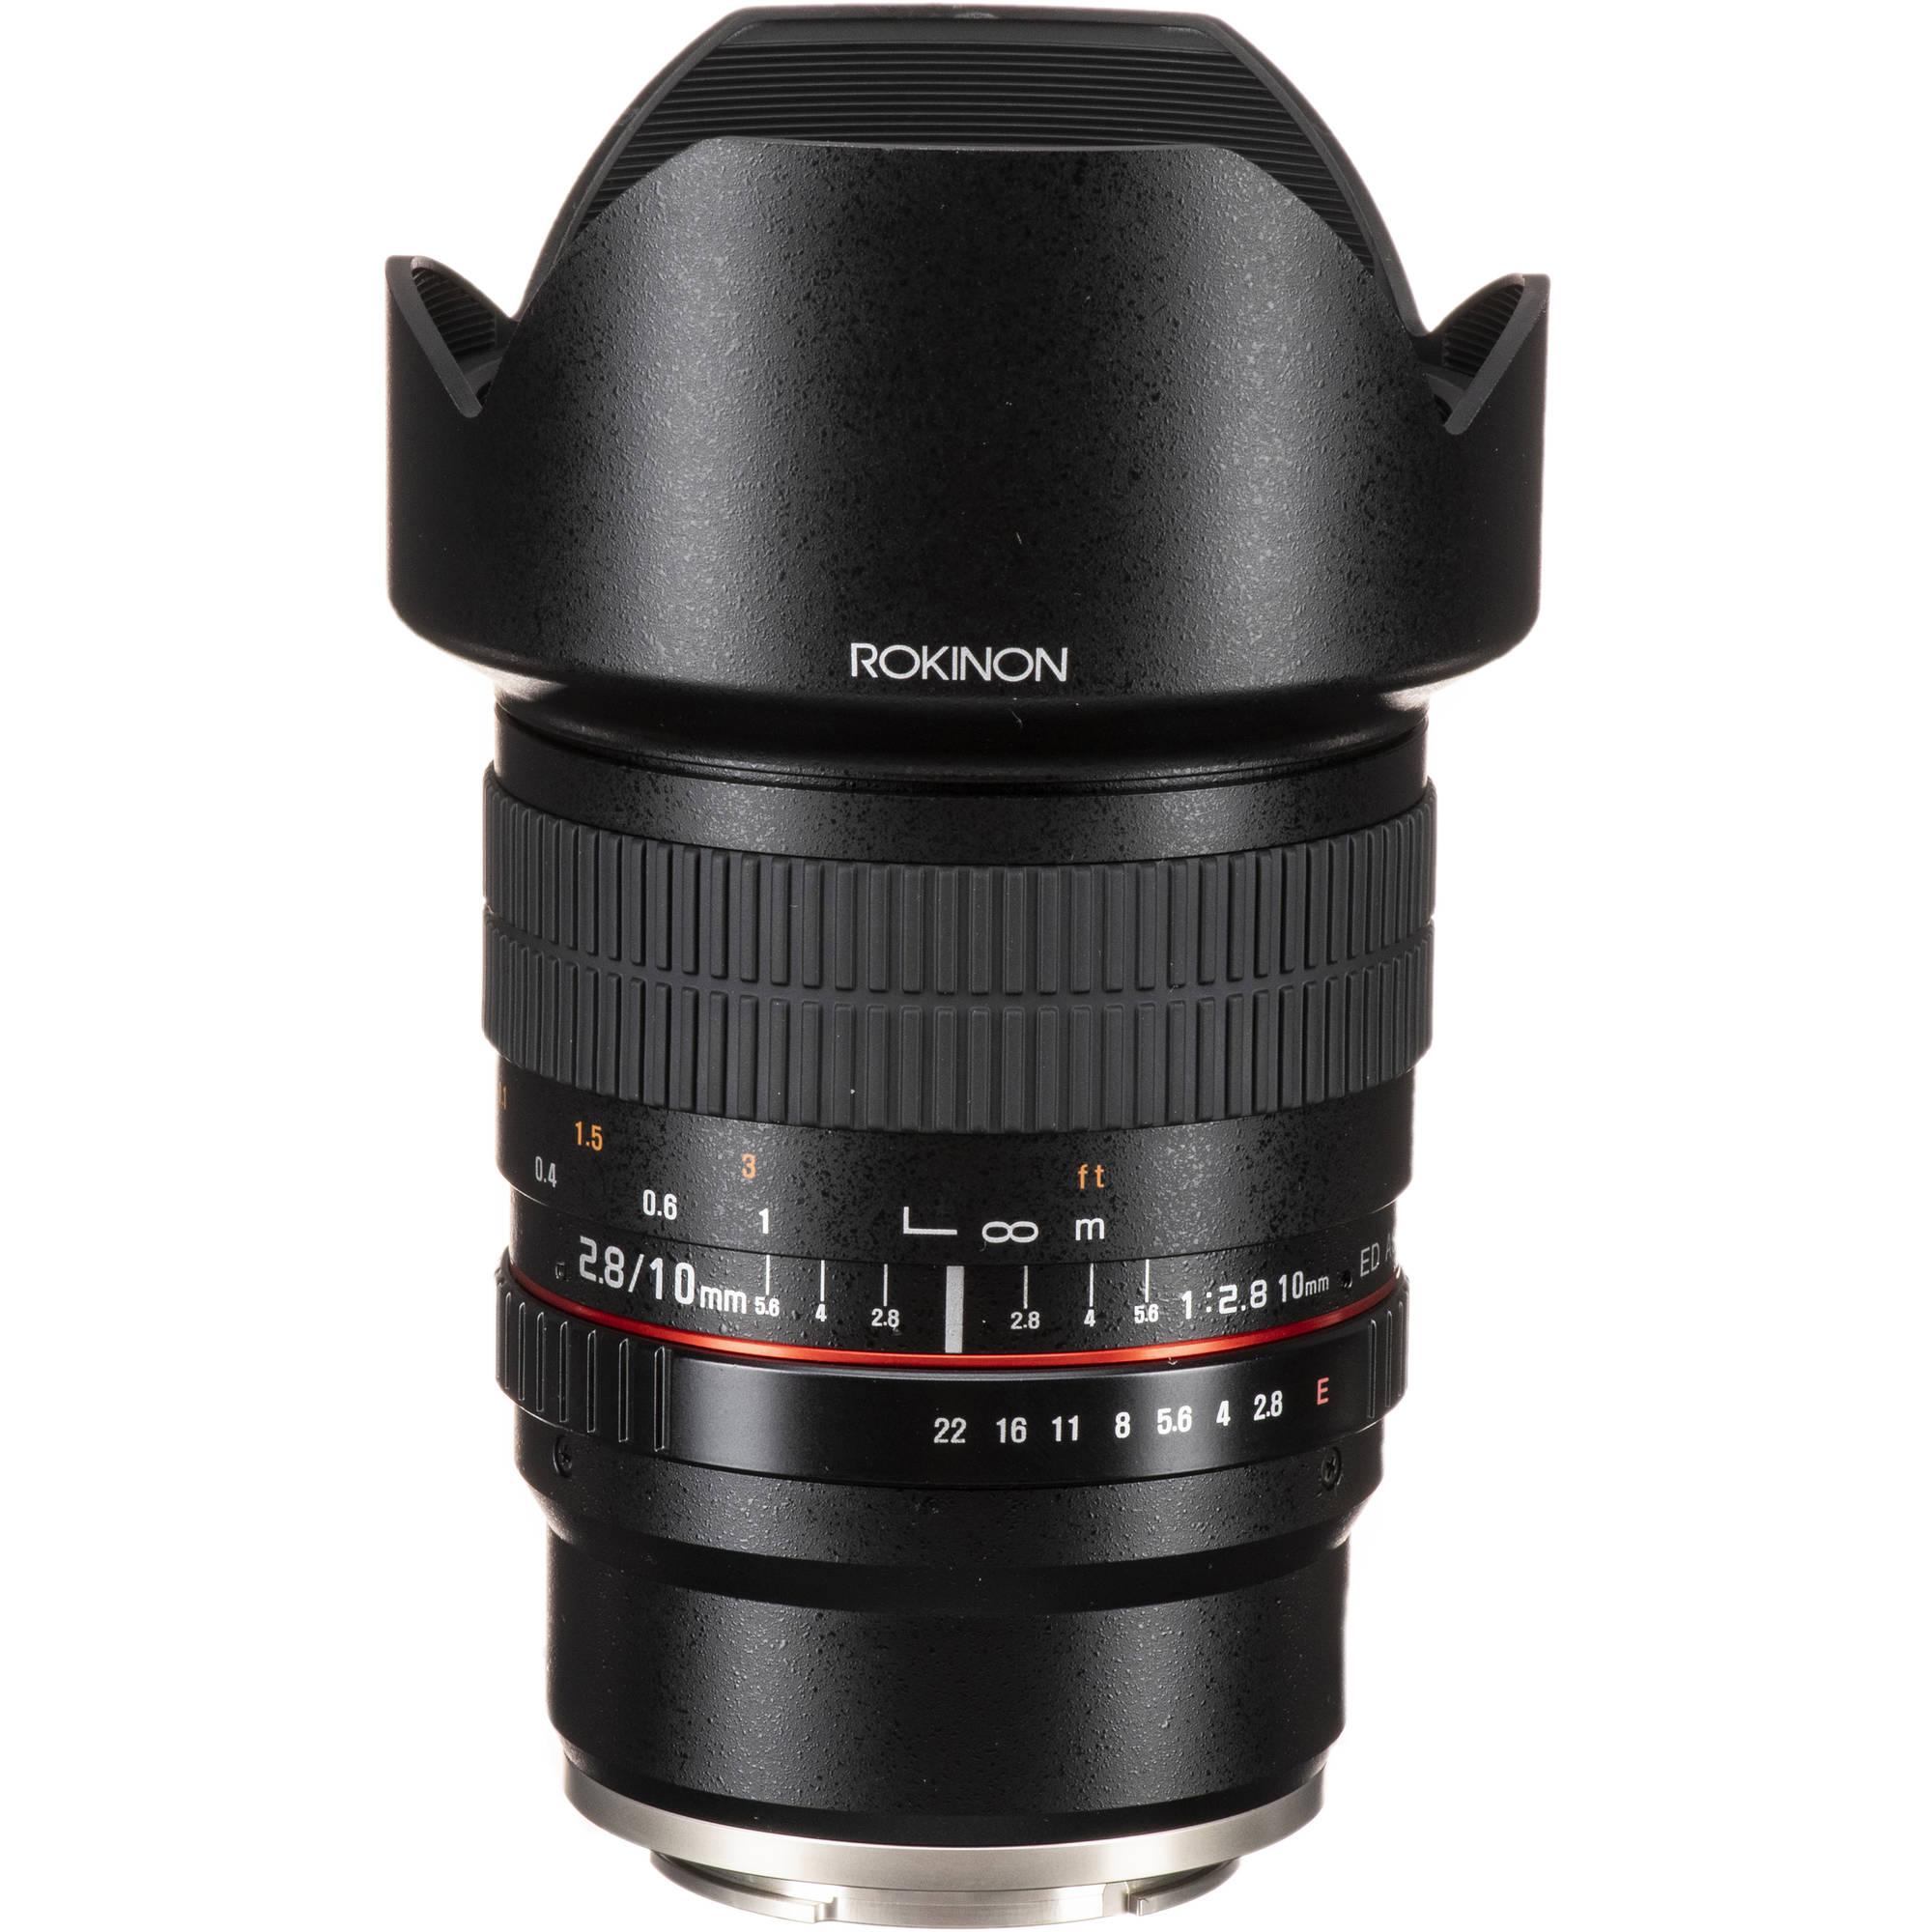 Rokinon 10mm F 28 Ed As Ncs Cs Lens For Sony E Mount 10m Bh 7artisans 12mm Fuji Black